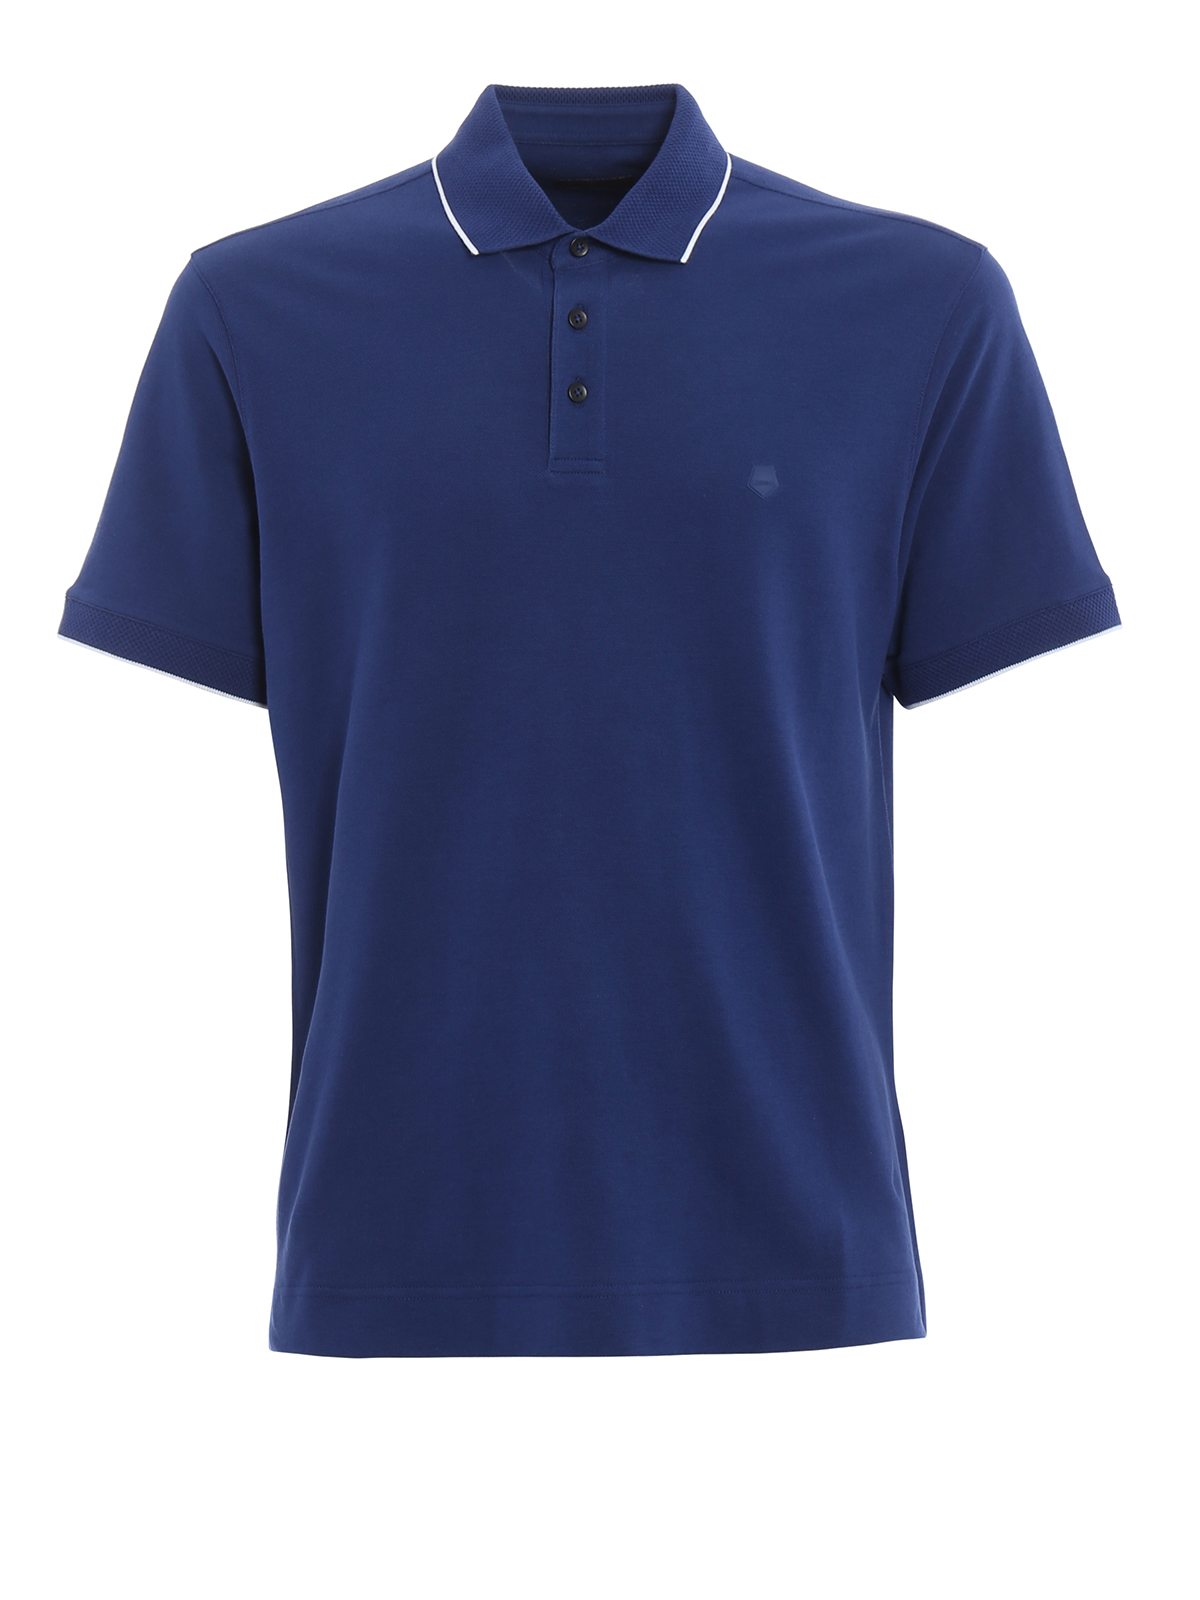 Cotton pique polo shirt by z zegna polo shirts ikrix for Zegna polo shirts sale